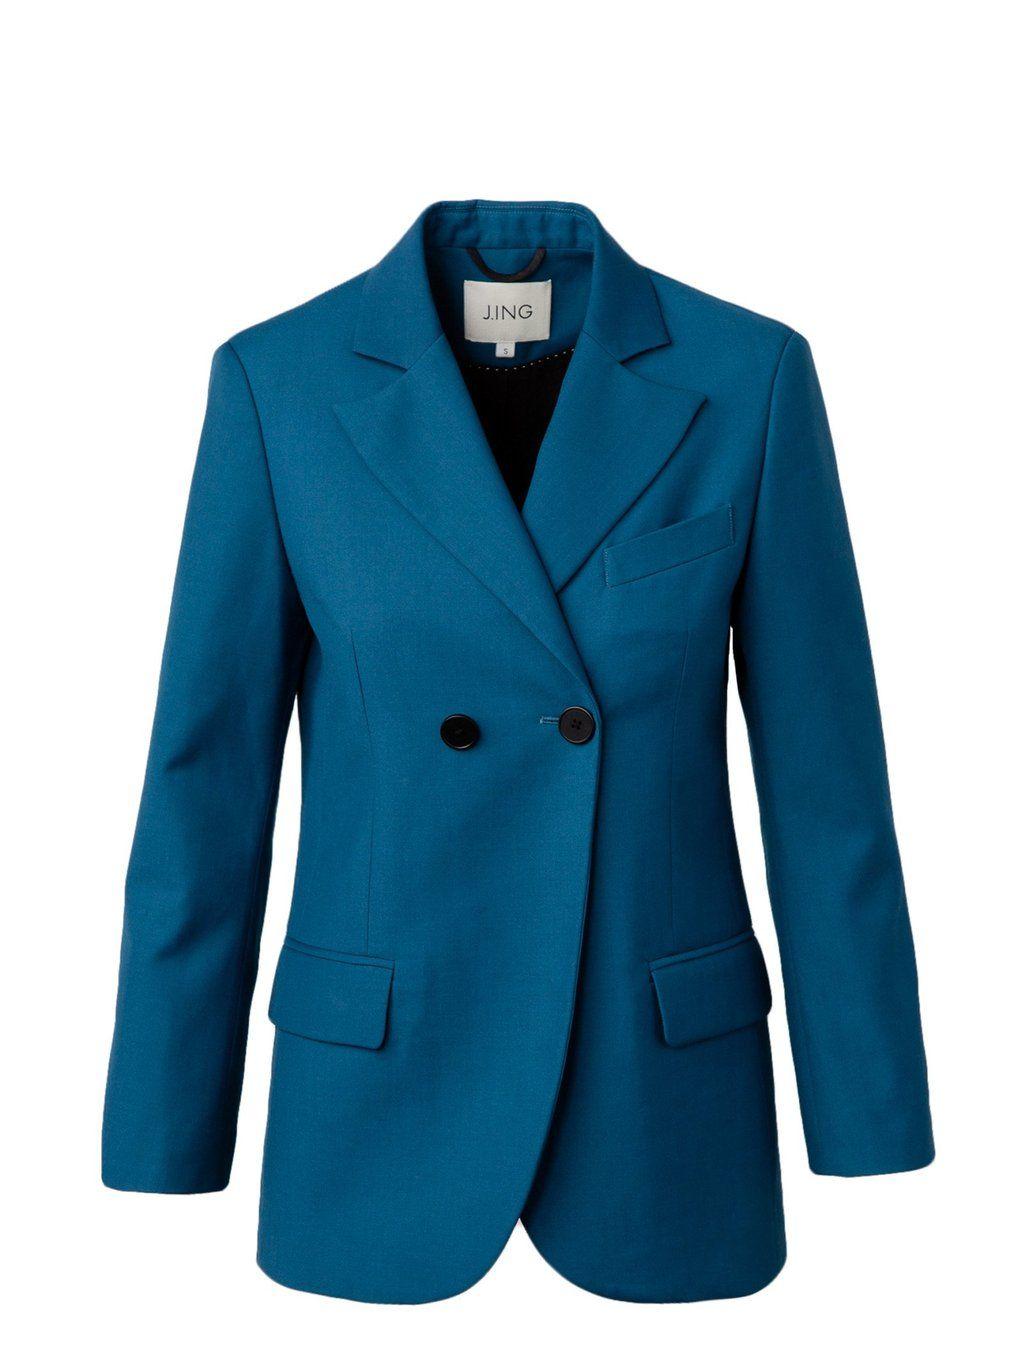 Josie Blazer in turquoise by j.ing women's clothing